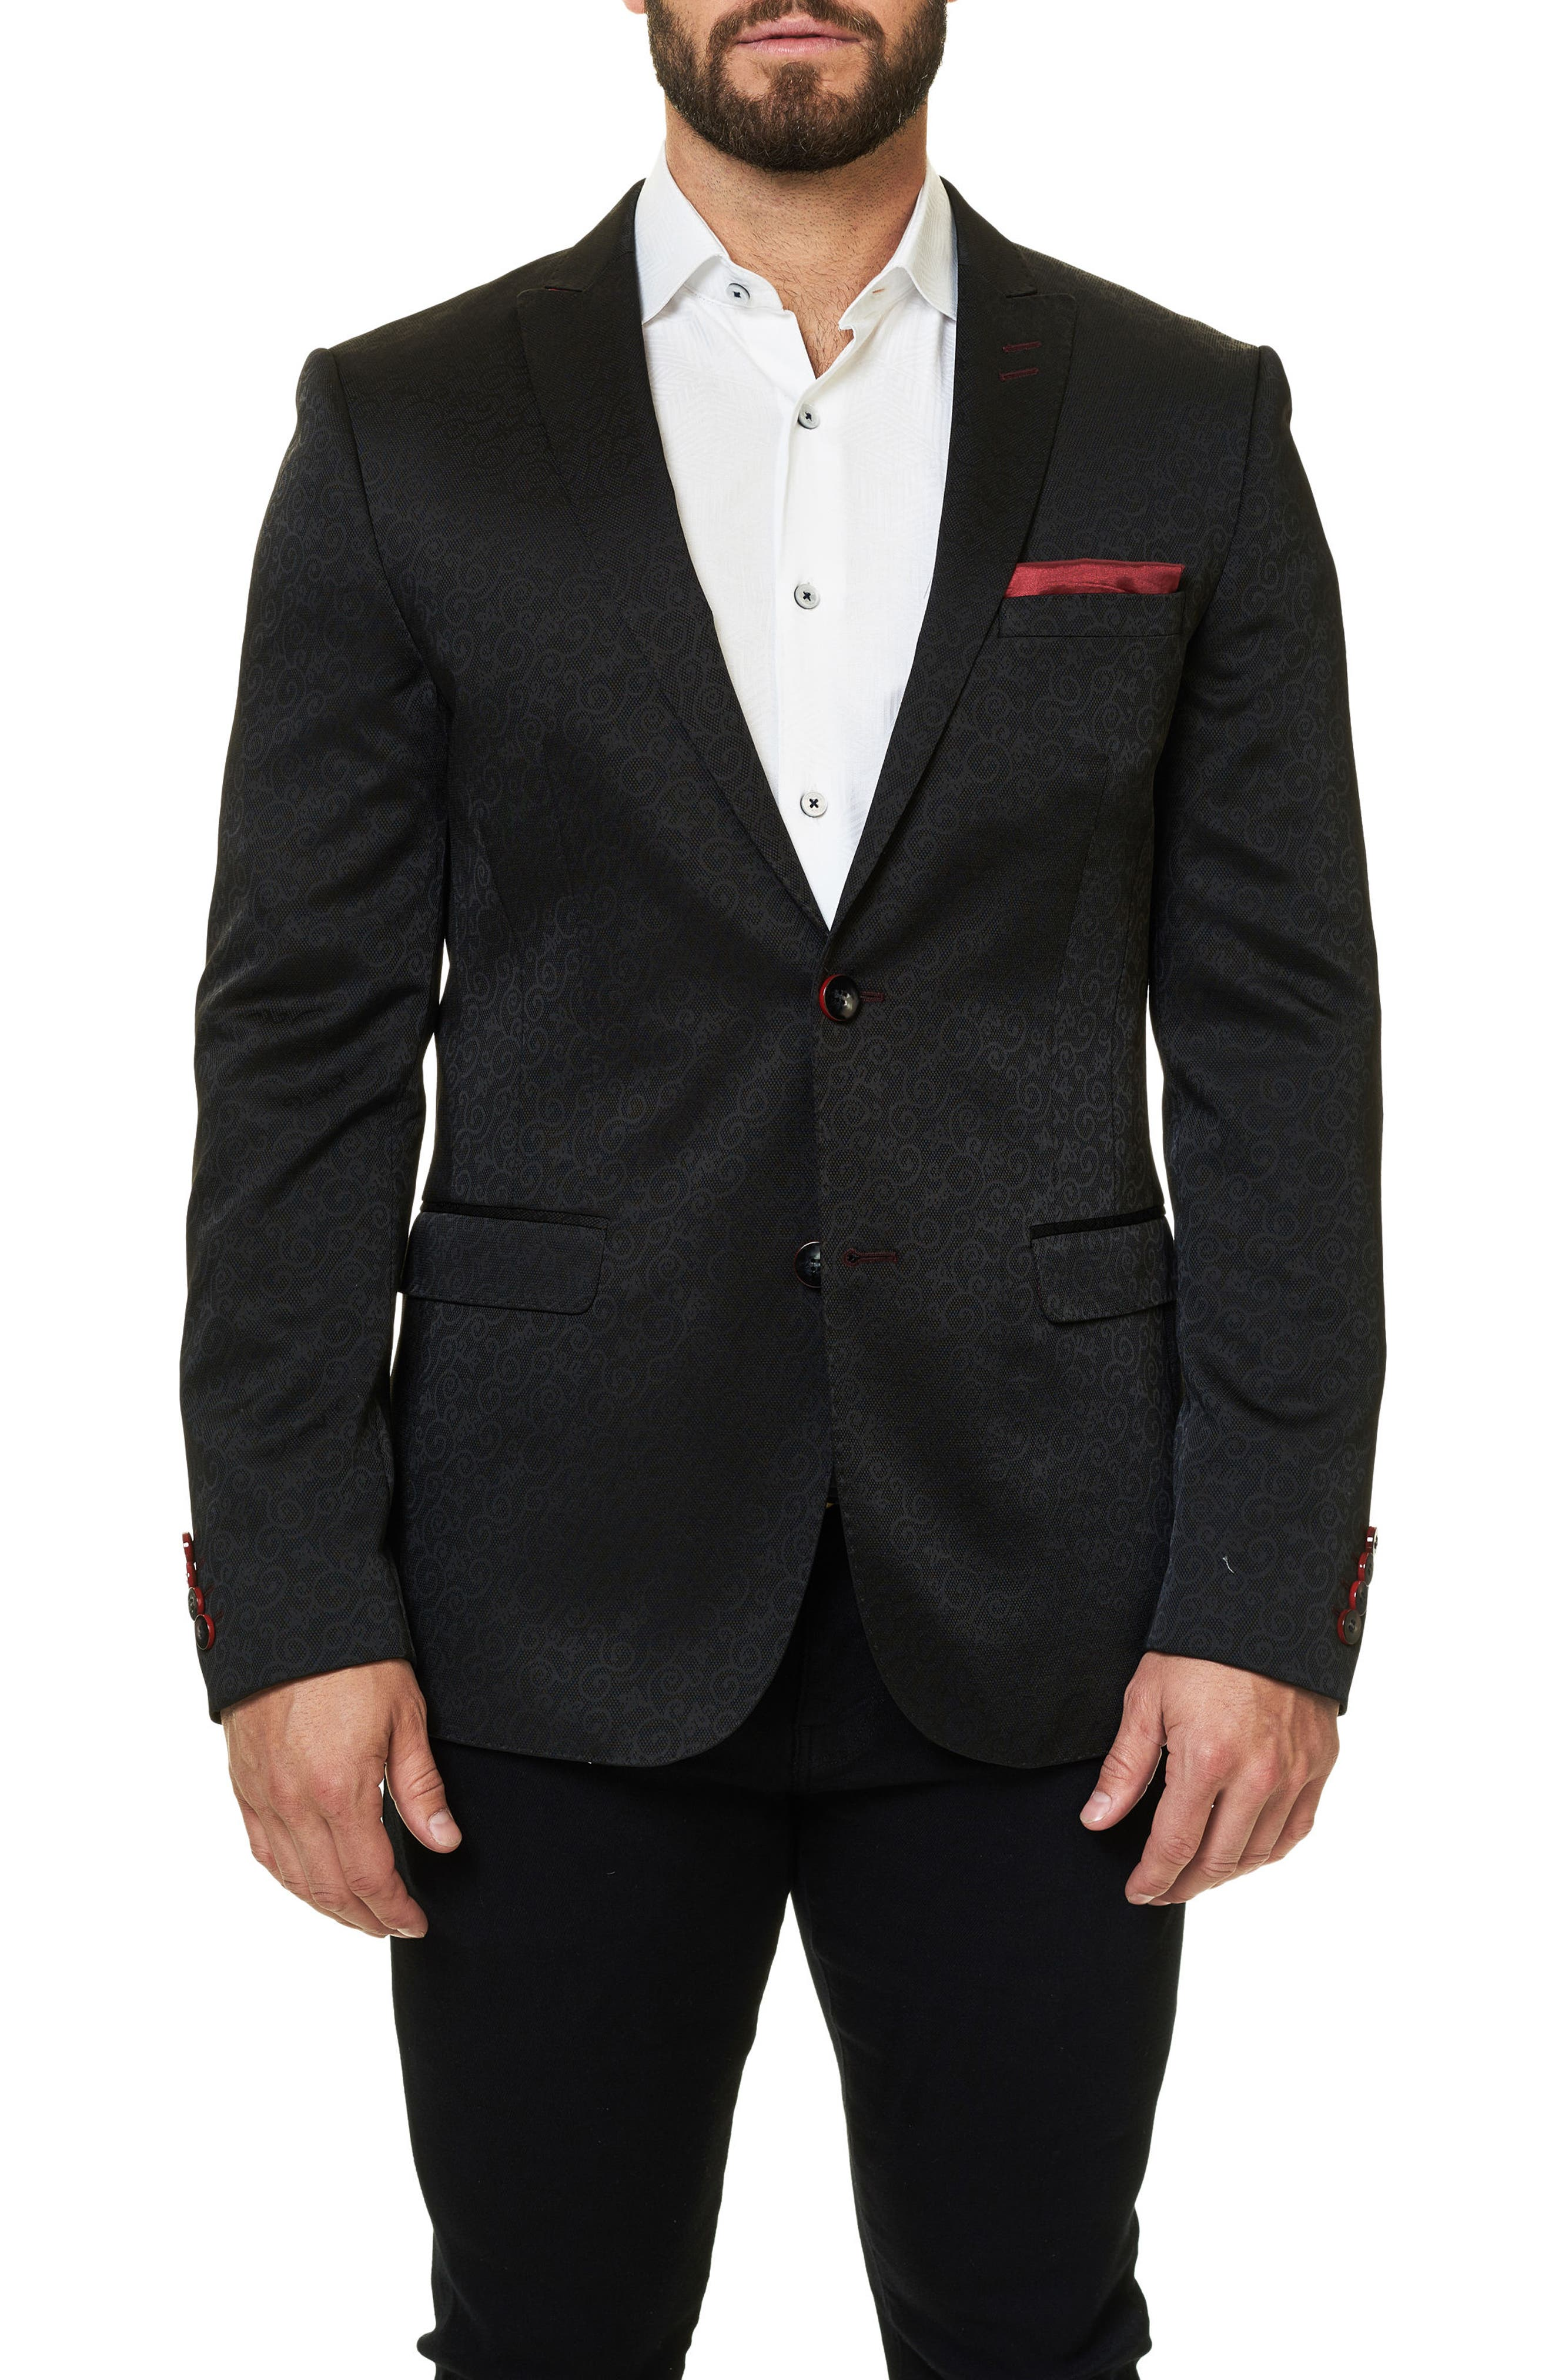 Descartes Jacquard Sport Coat,                         Main,                         color, Solid Black